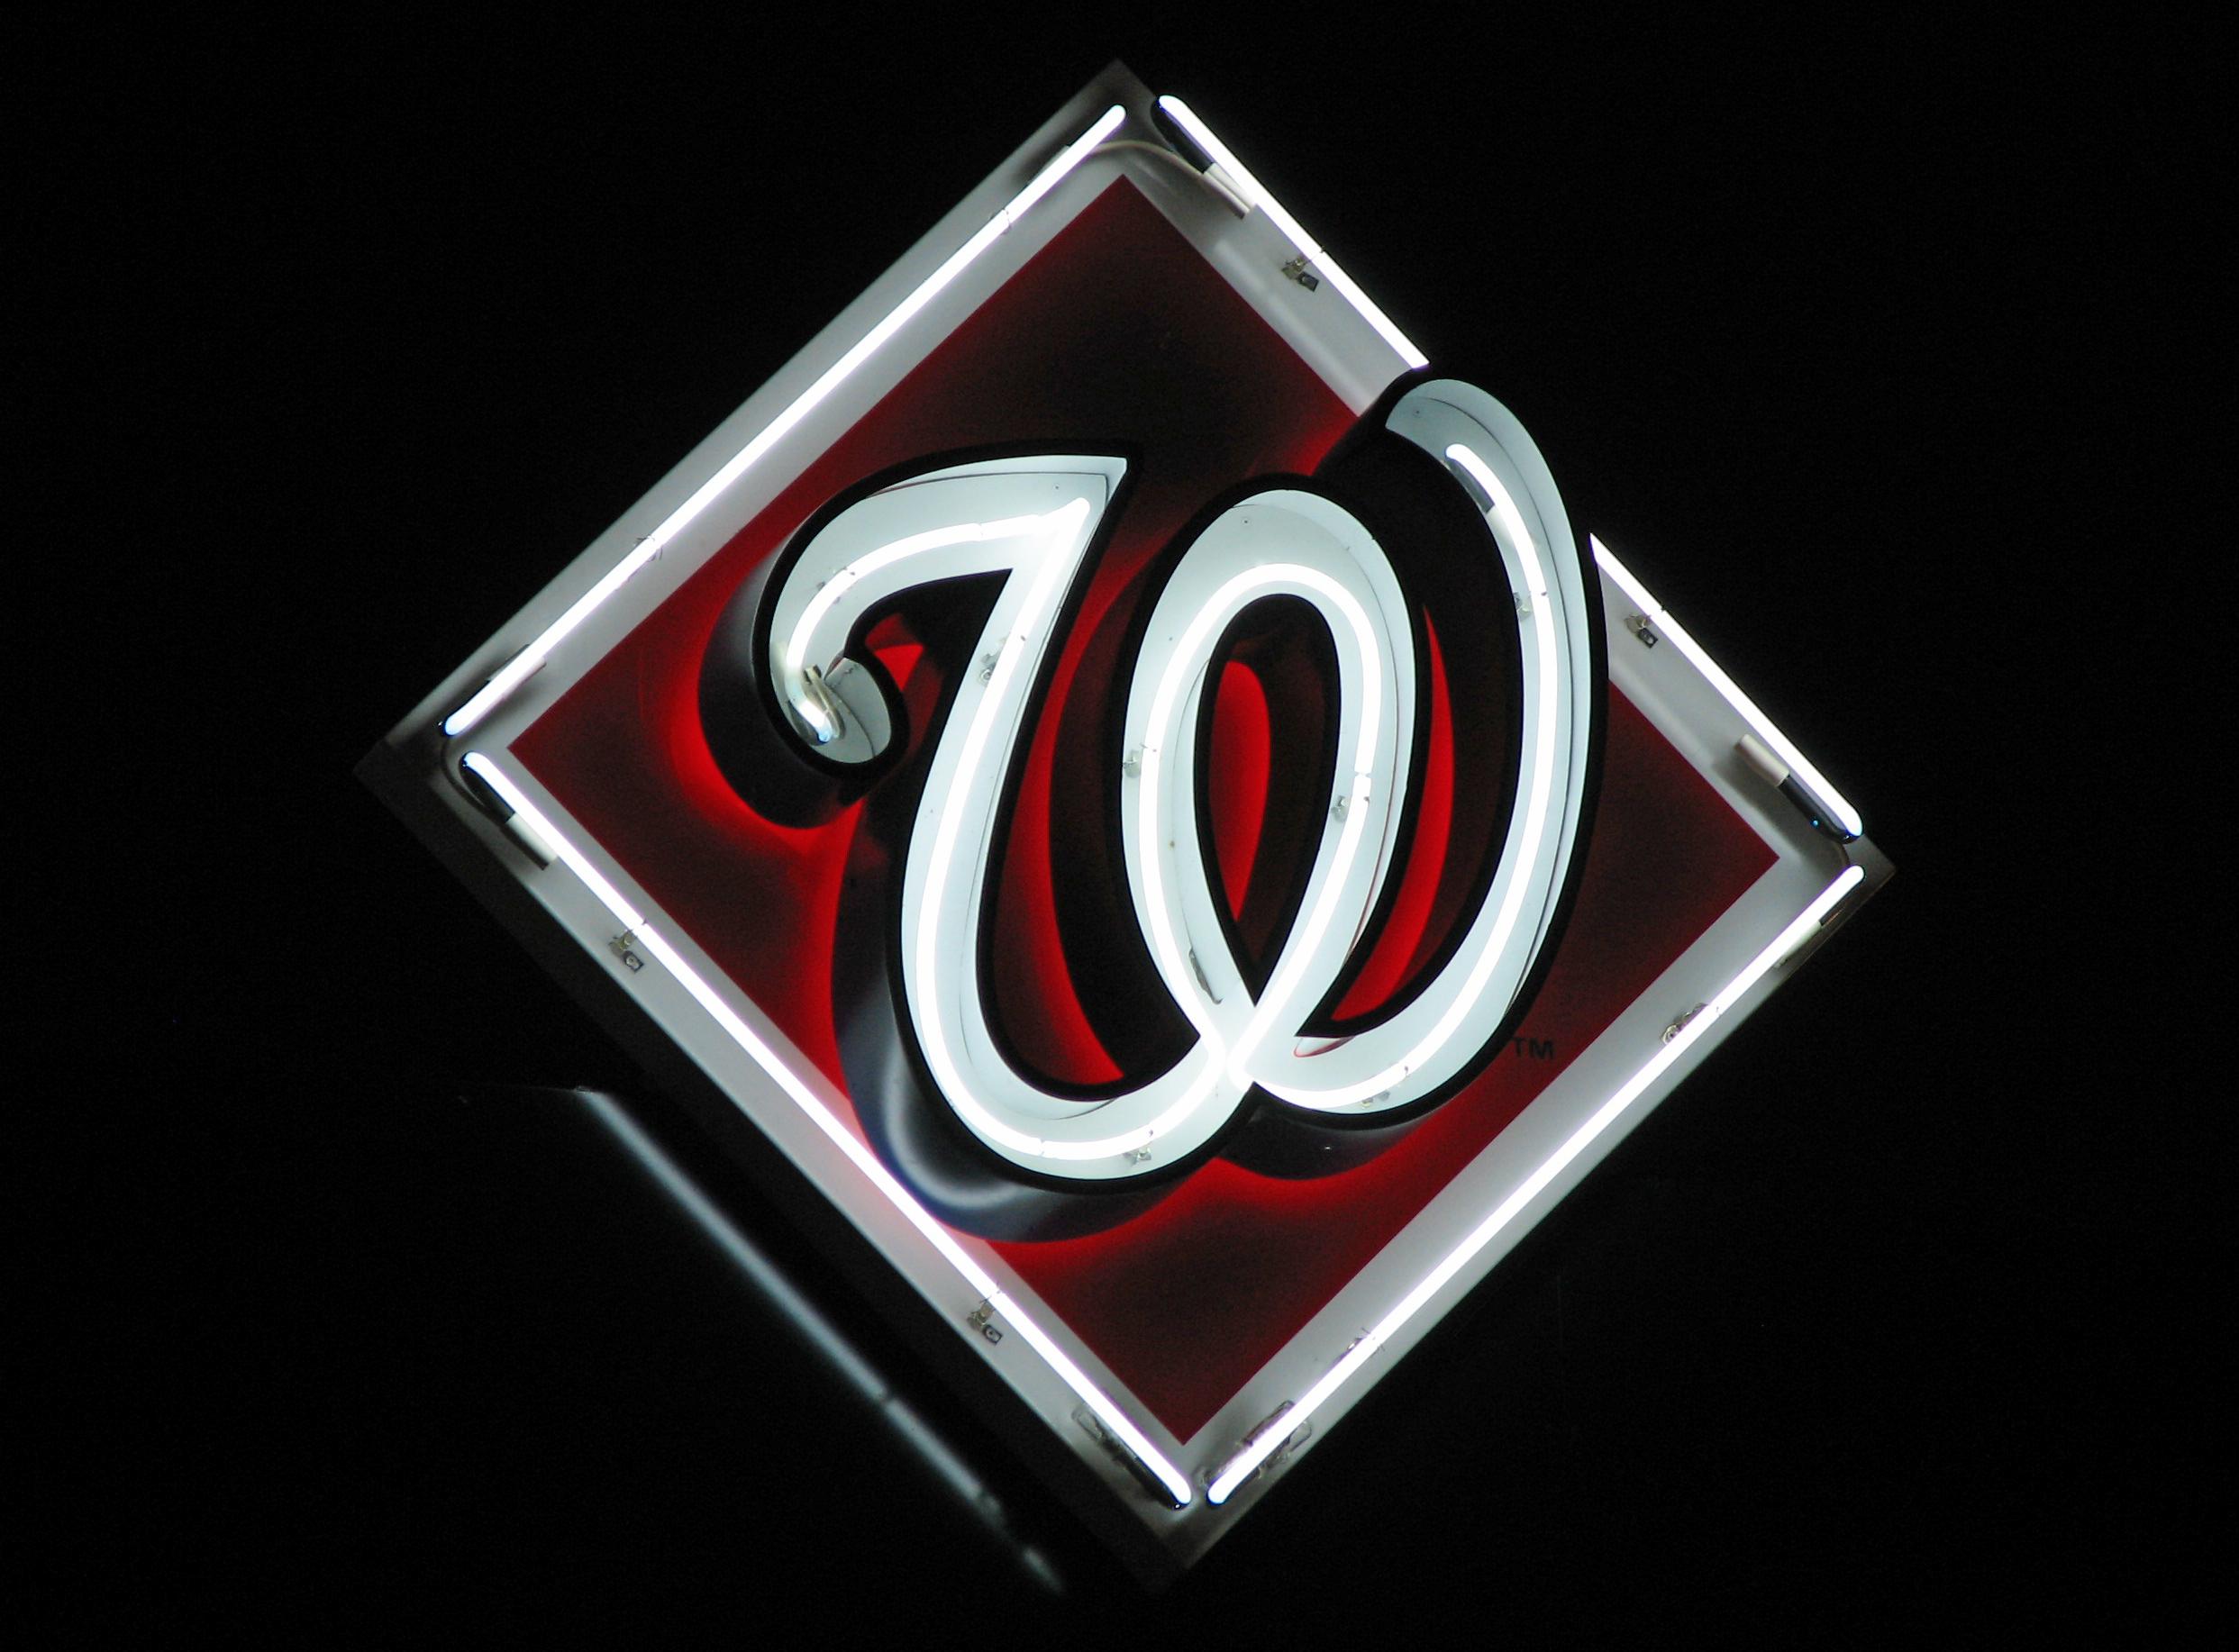 WASHINGTON NATIONALS mlb baseball 32 wallpaper background 2485x1834